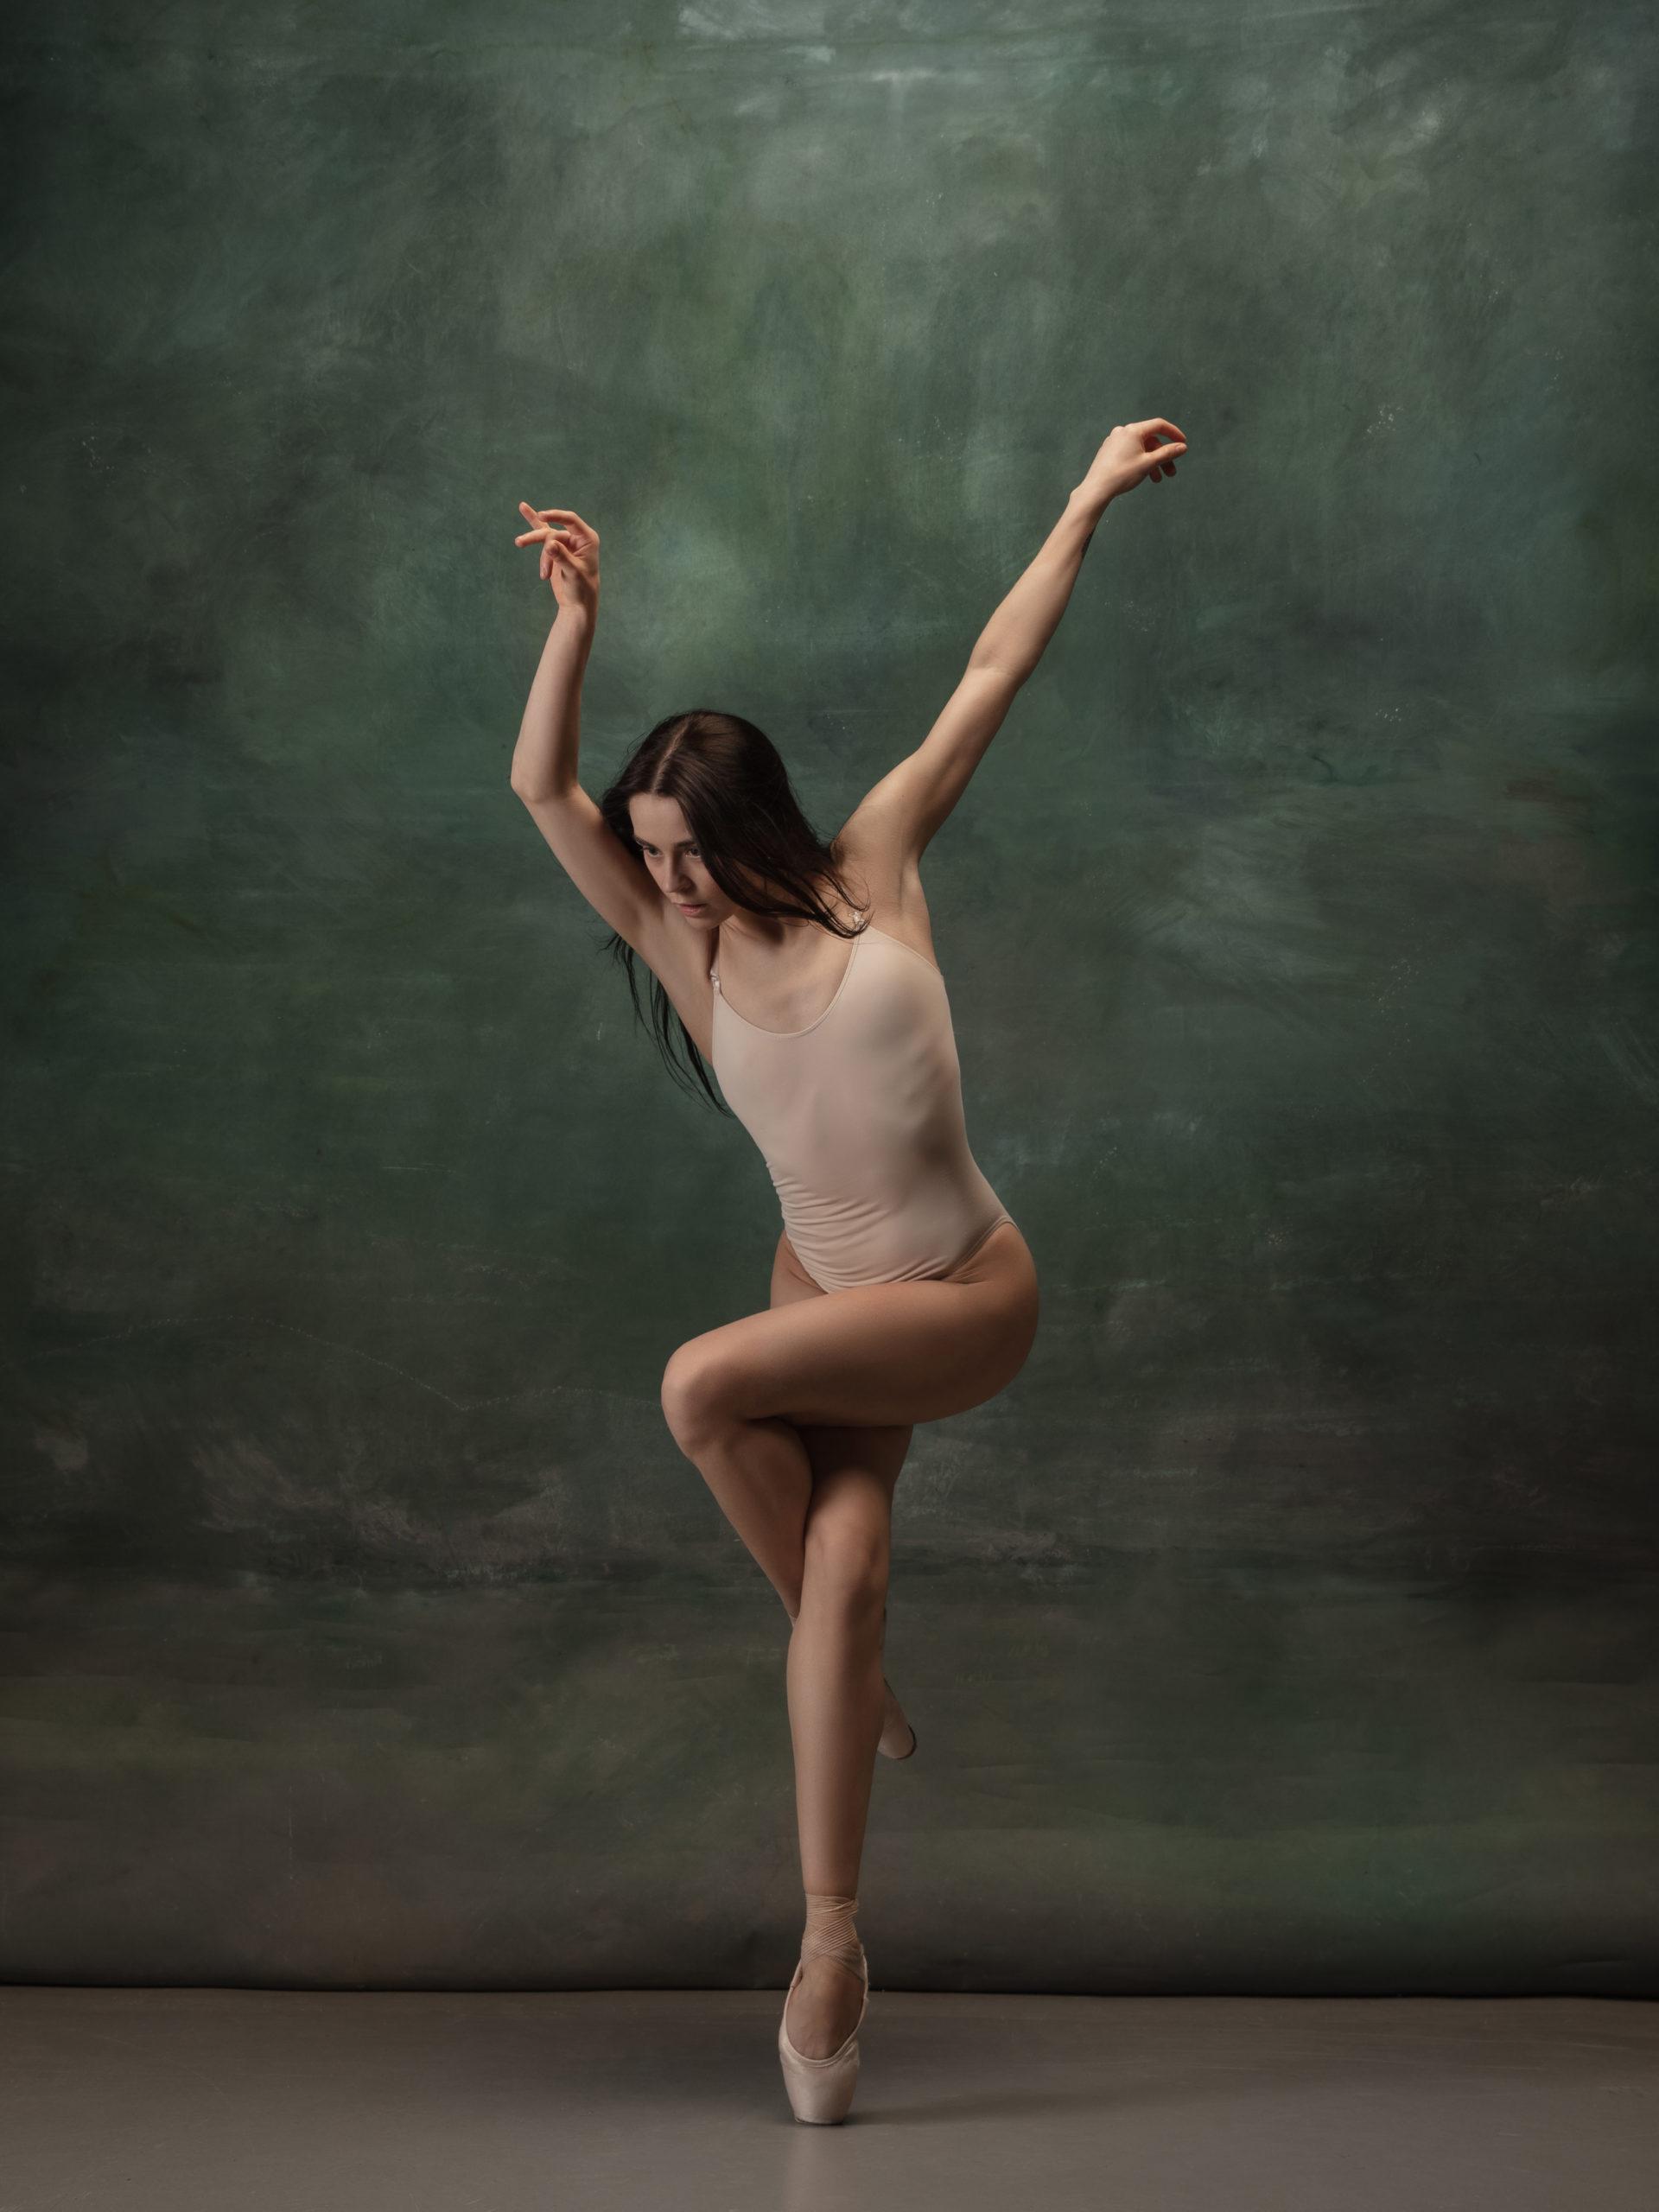 Young graceful tender ballerina on dark green studio background @ vova130555@gmail.com